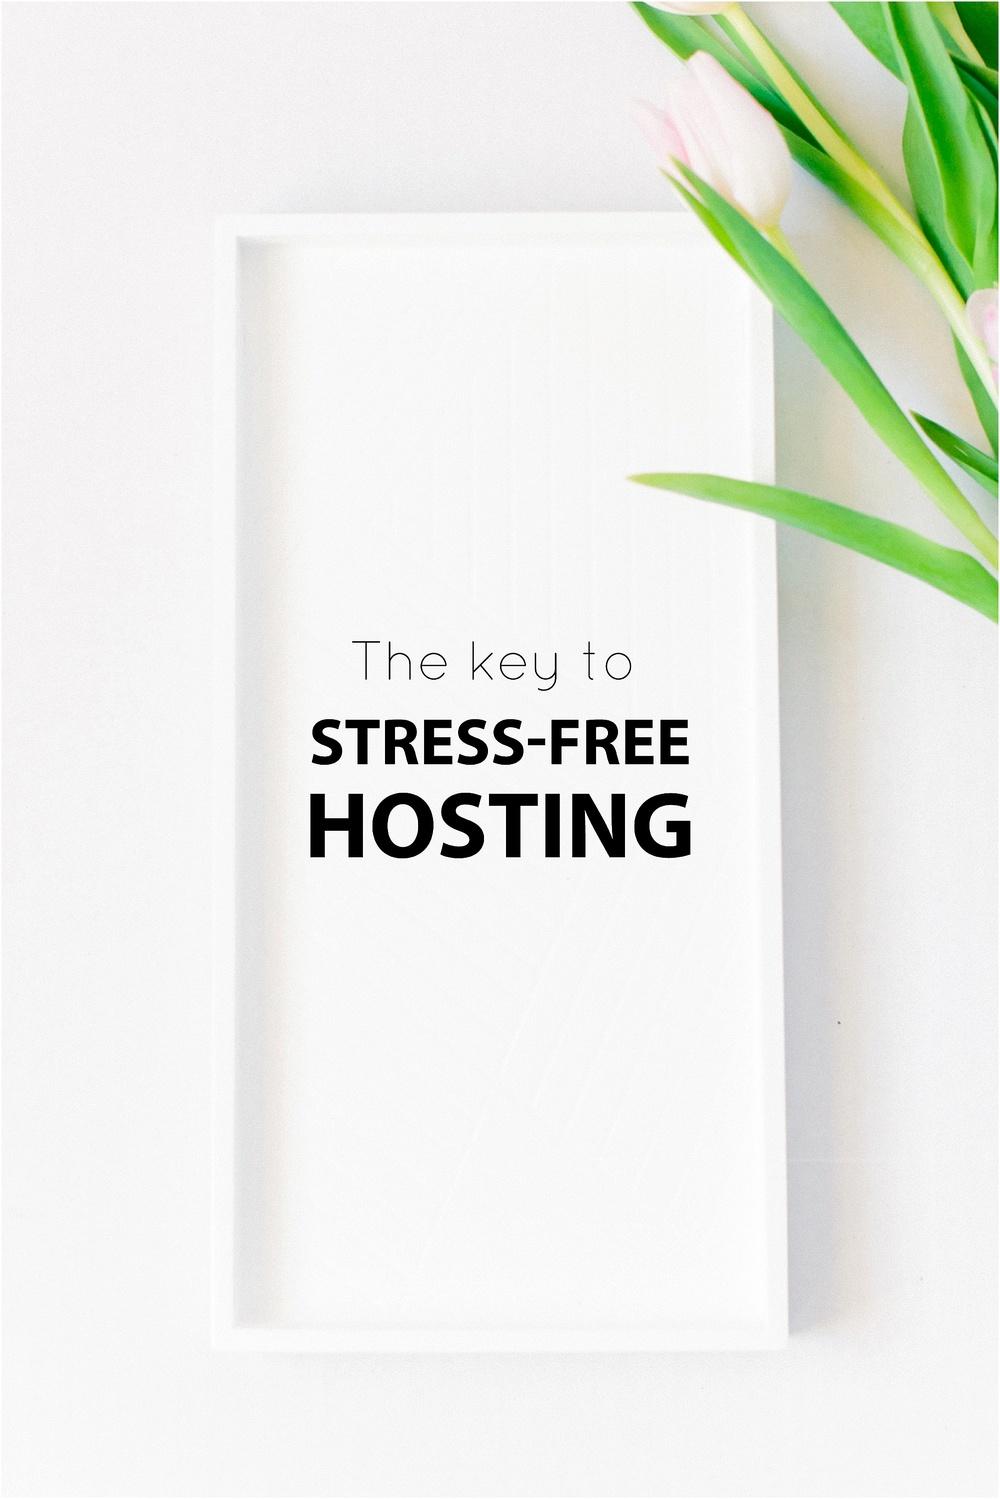 The Key to Stress-Free Hosting with He Loves Me Flowers + Jordan Brittley (www.jordanbrittleyblog.com)